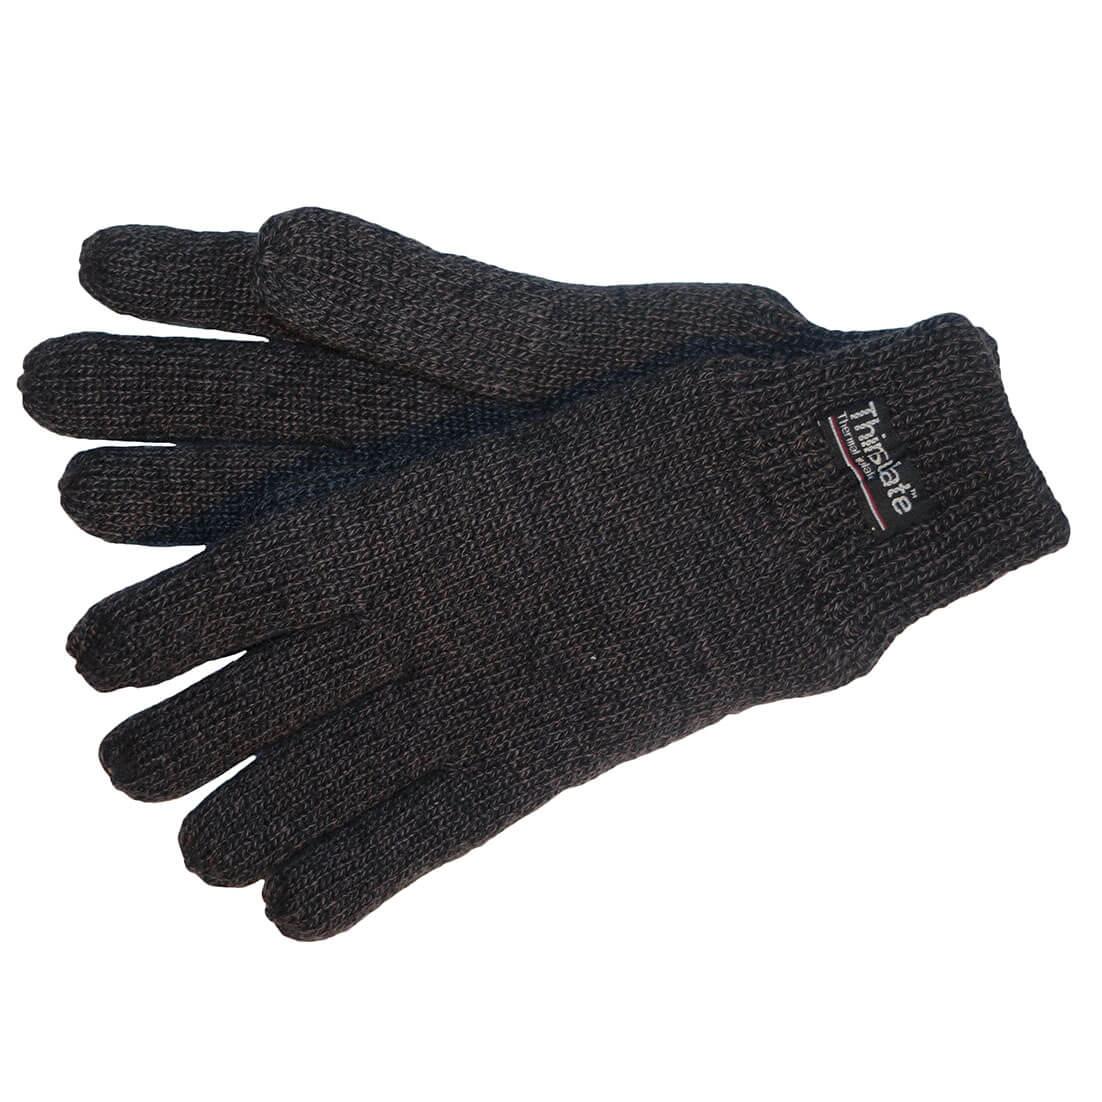 Thinsulate Handschoenen Donker Grijs L/XL-0